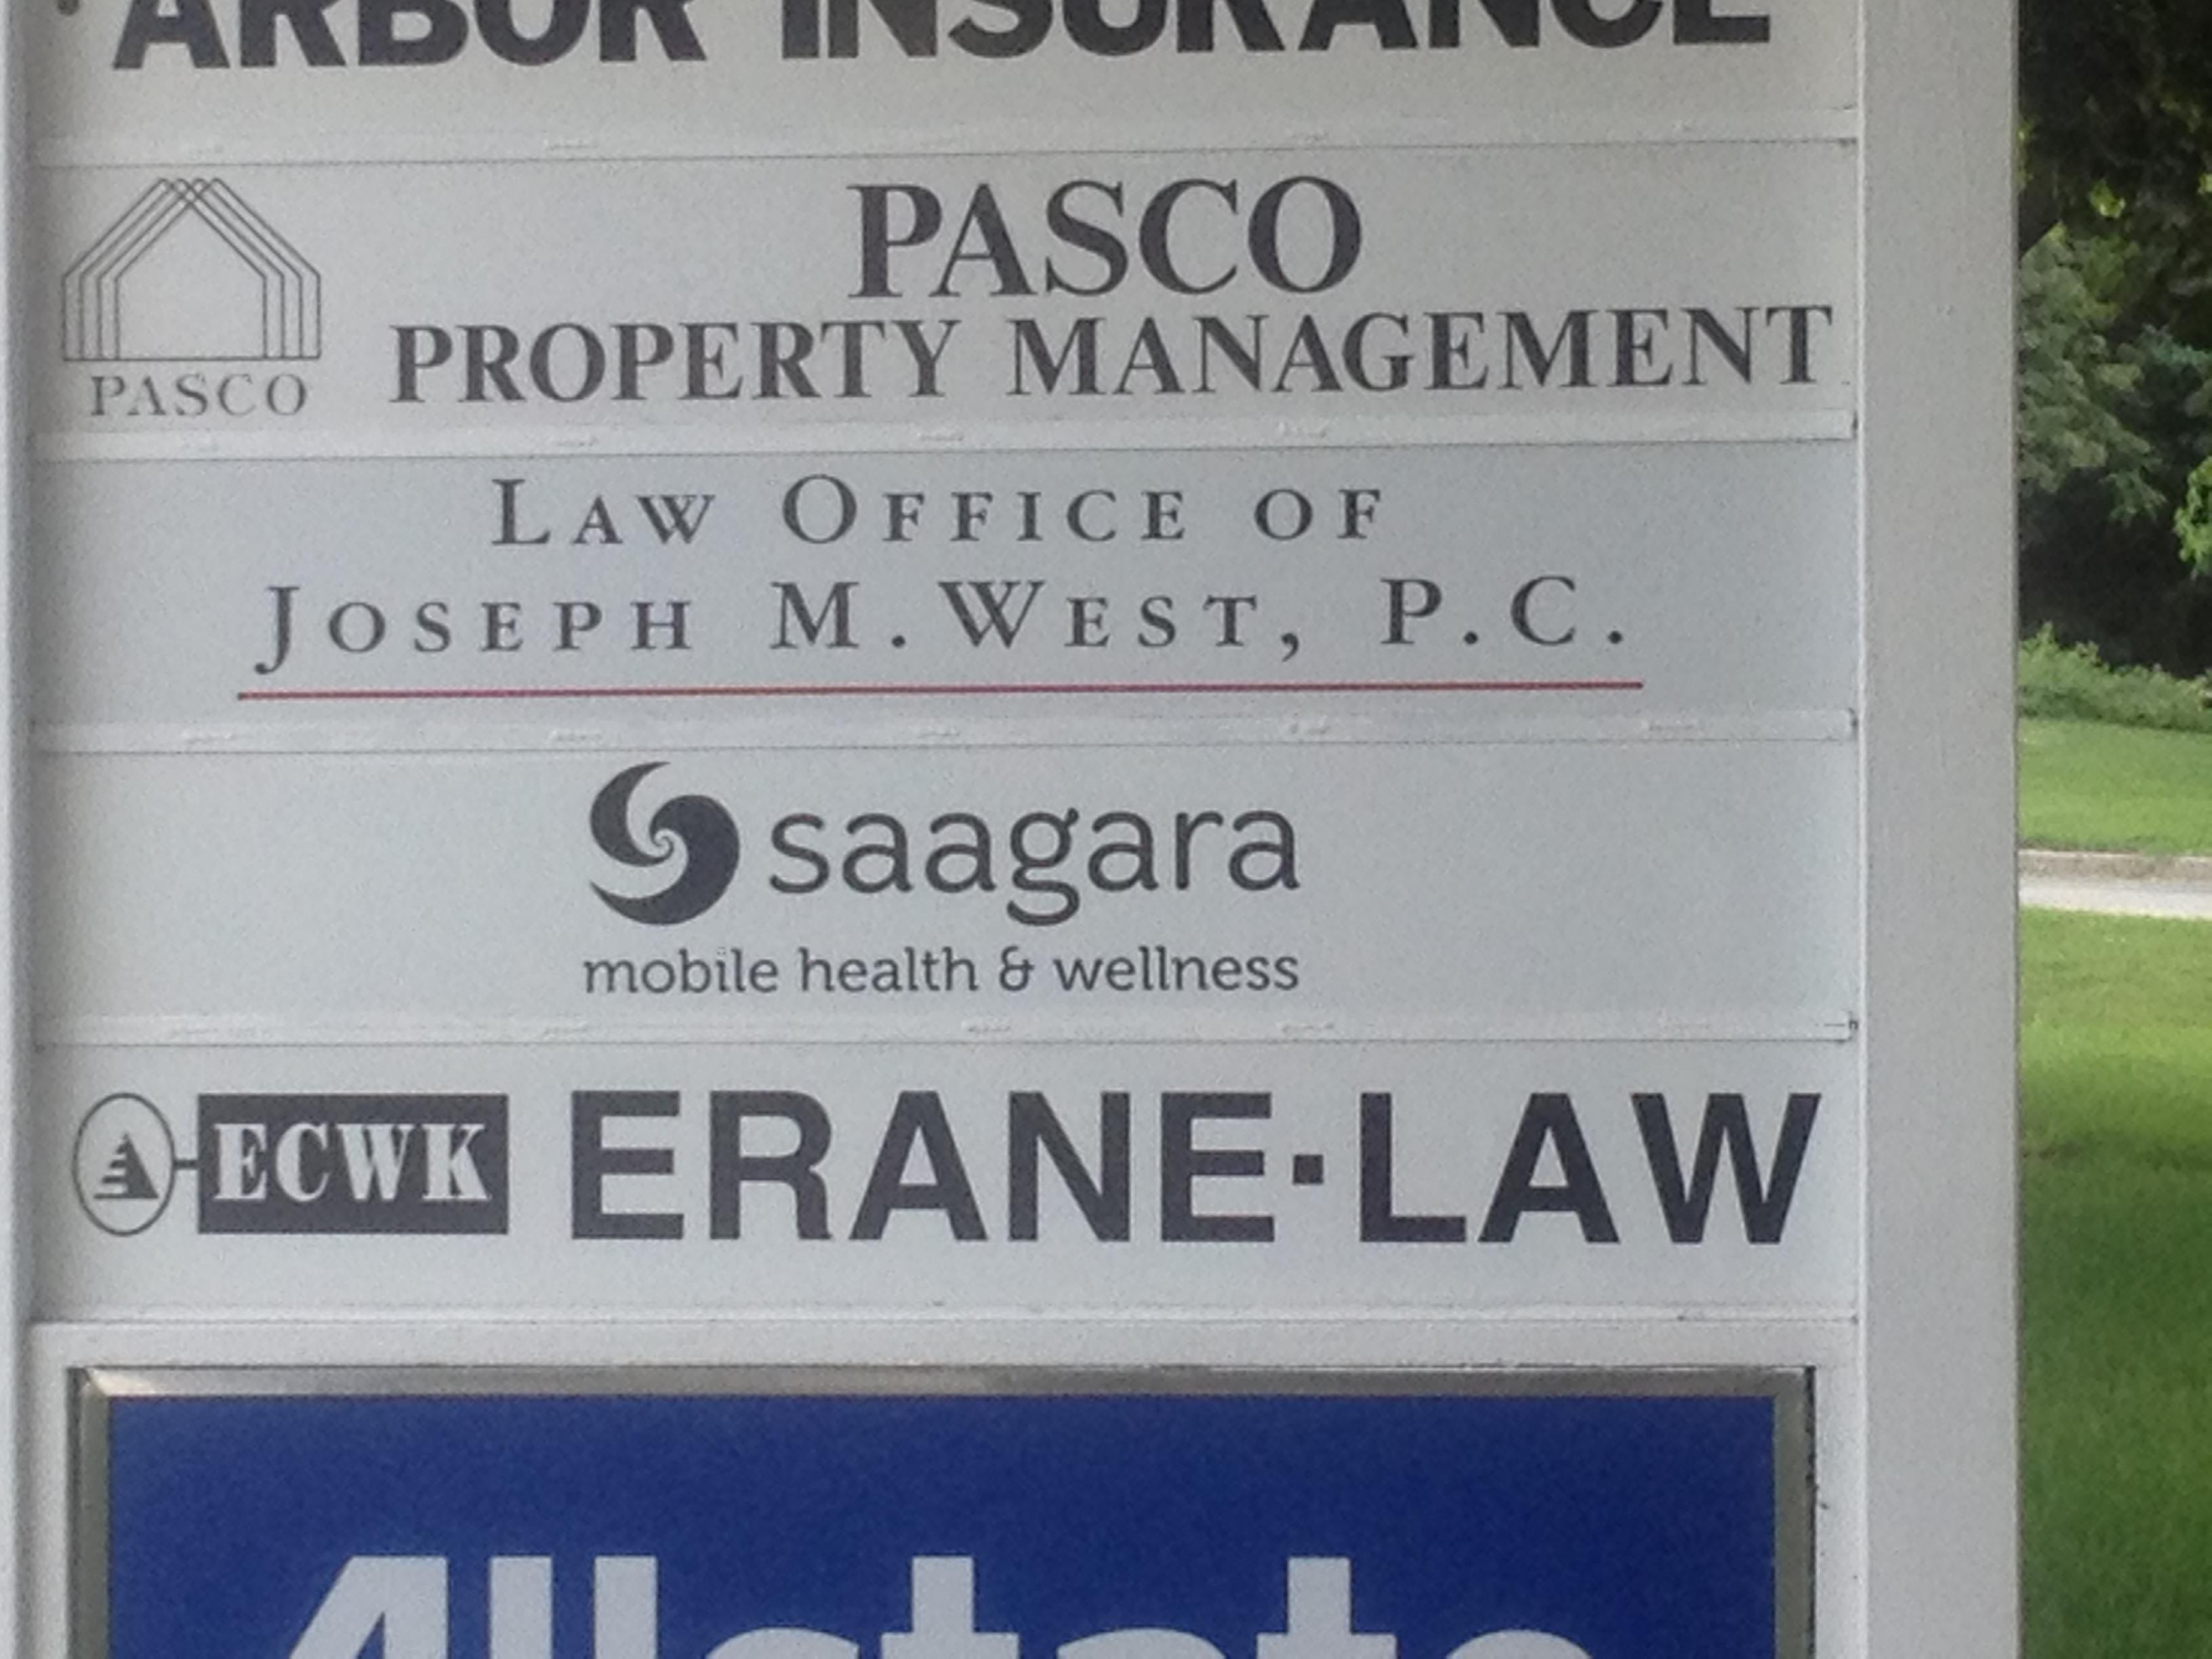 Law Firm of Erane C. Washington-Kendrick, PLLC